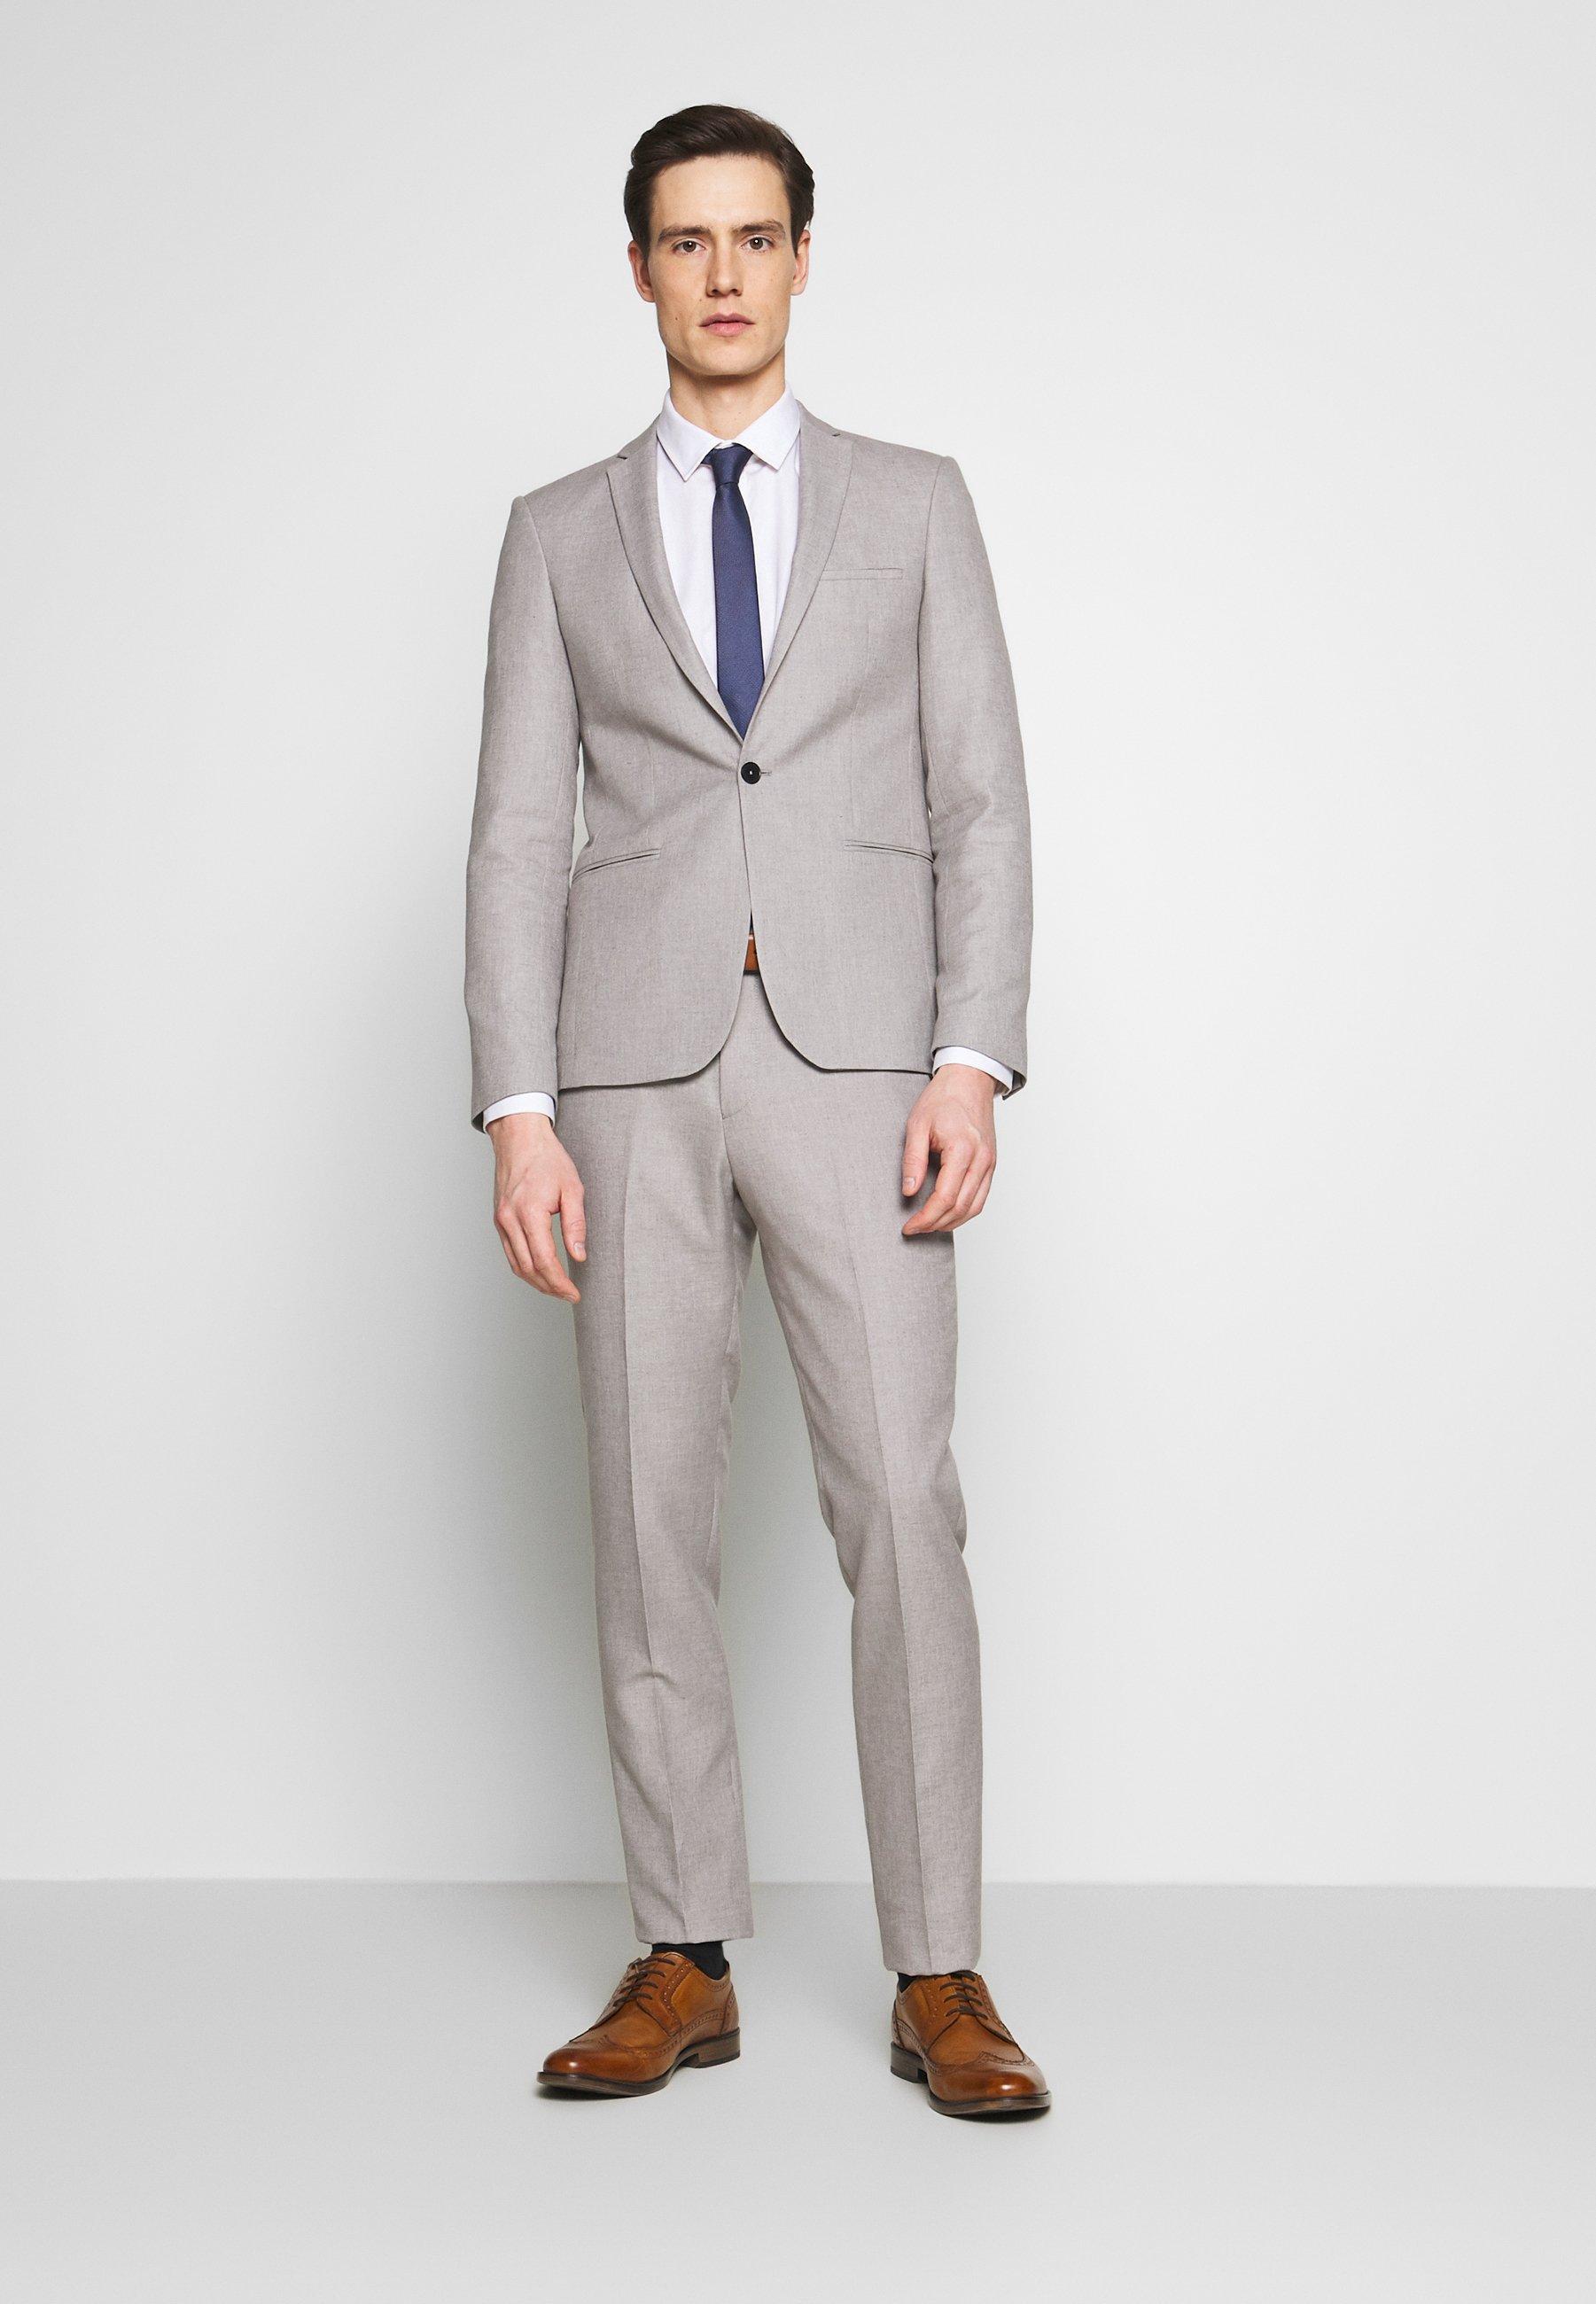 Viggo Prize Suit - Kostym Grey